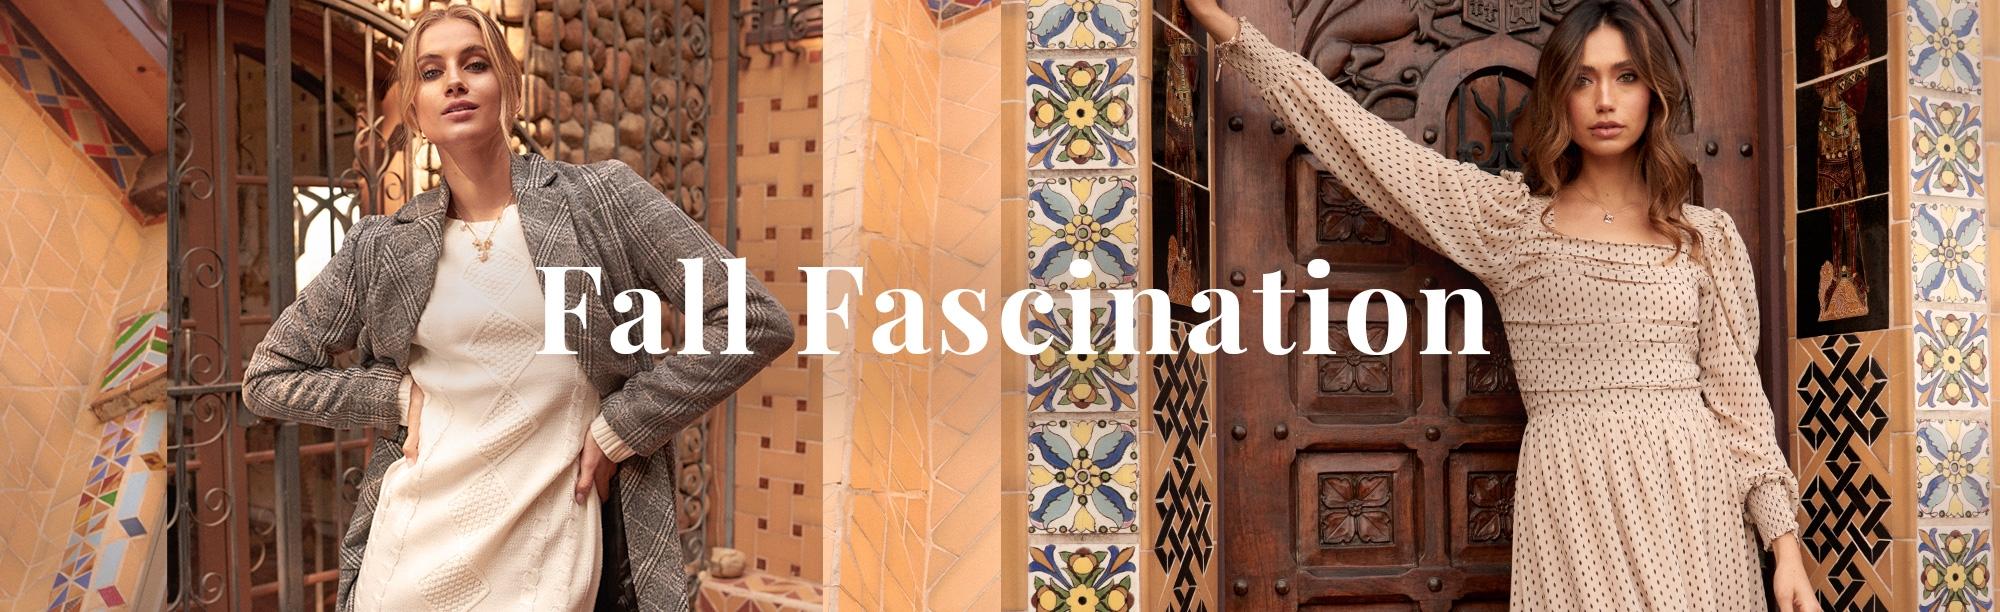 Fall Fascination